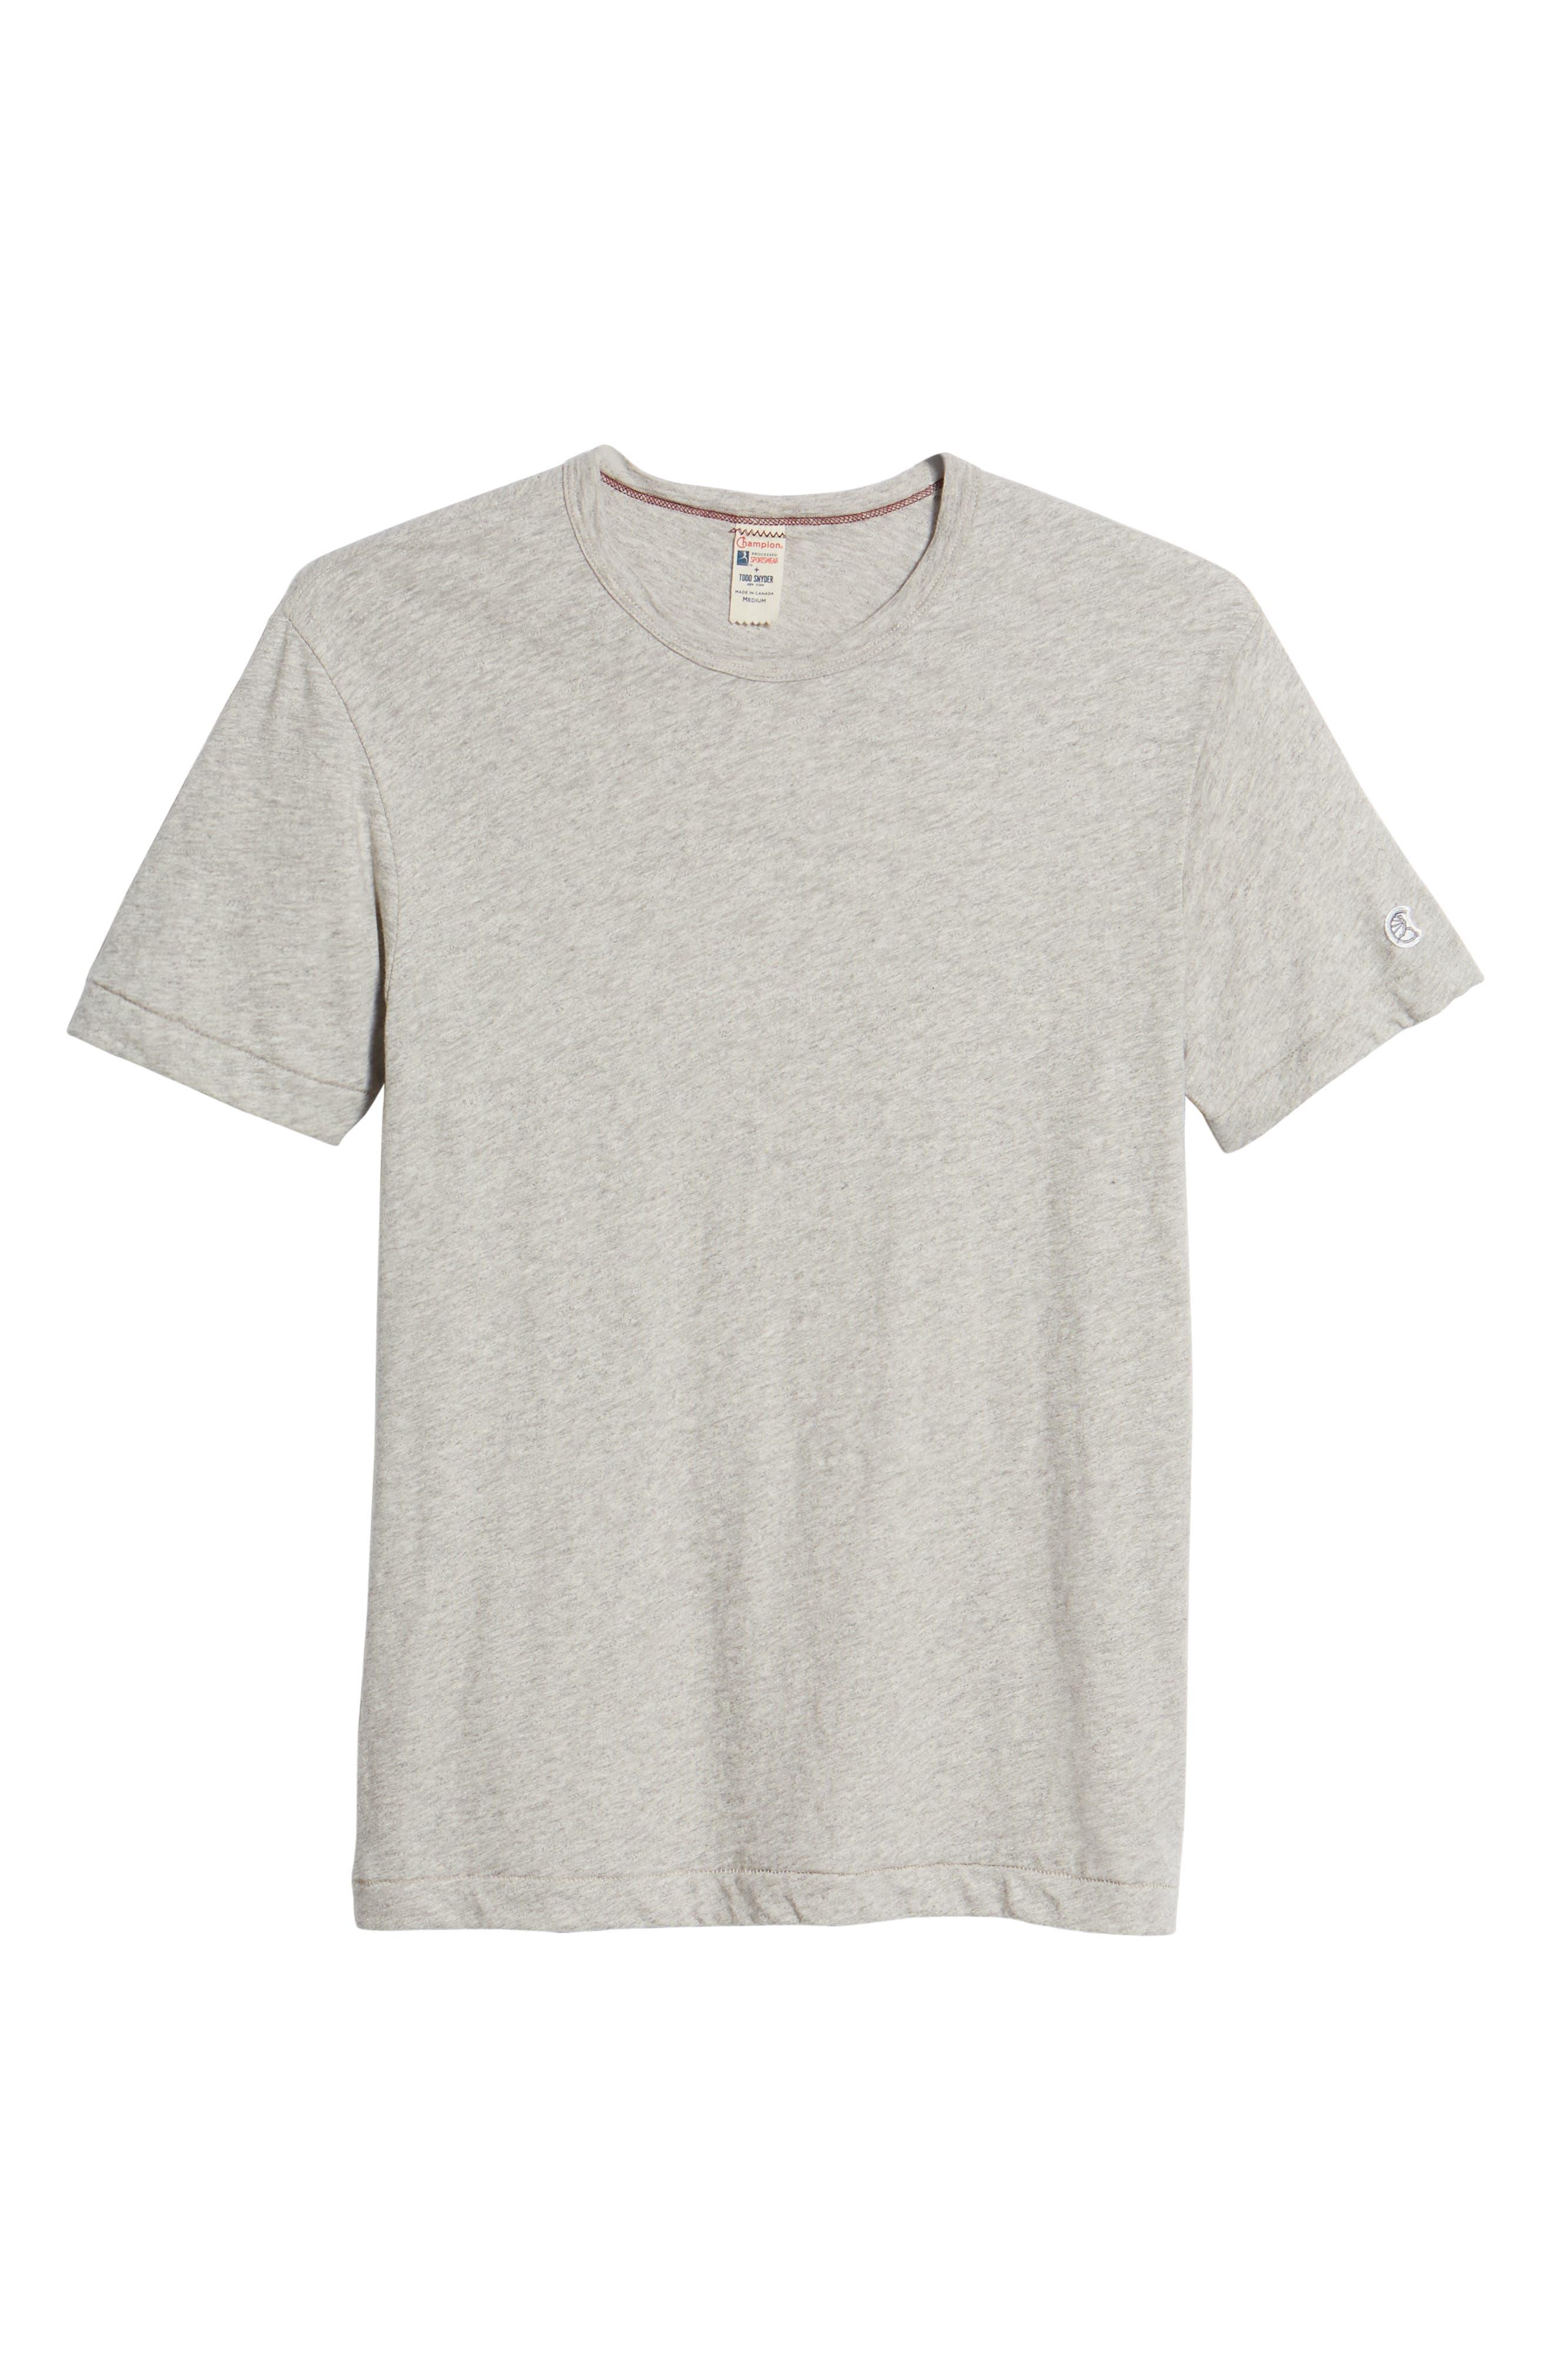 + Champion Heathered Crewneck T-Shirt,                             Alternate thumbnail 6, color,                             Antique Grey Mix